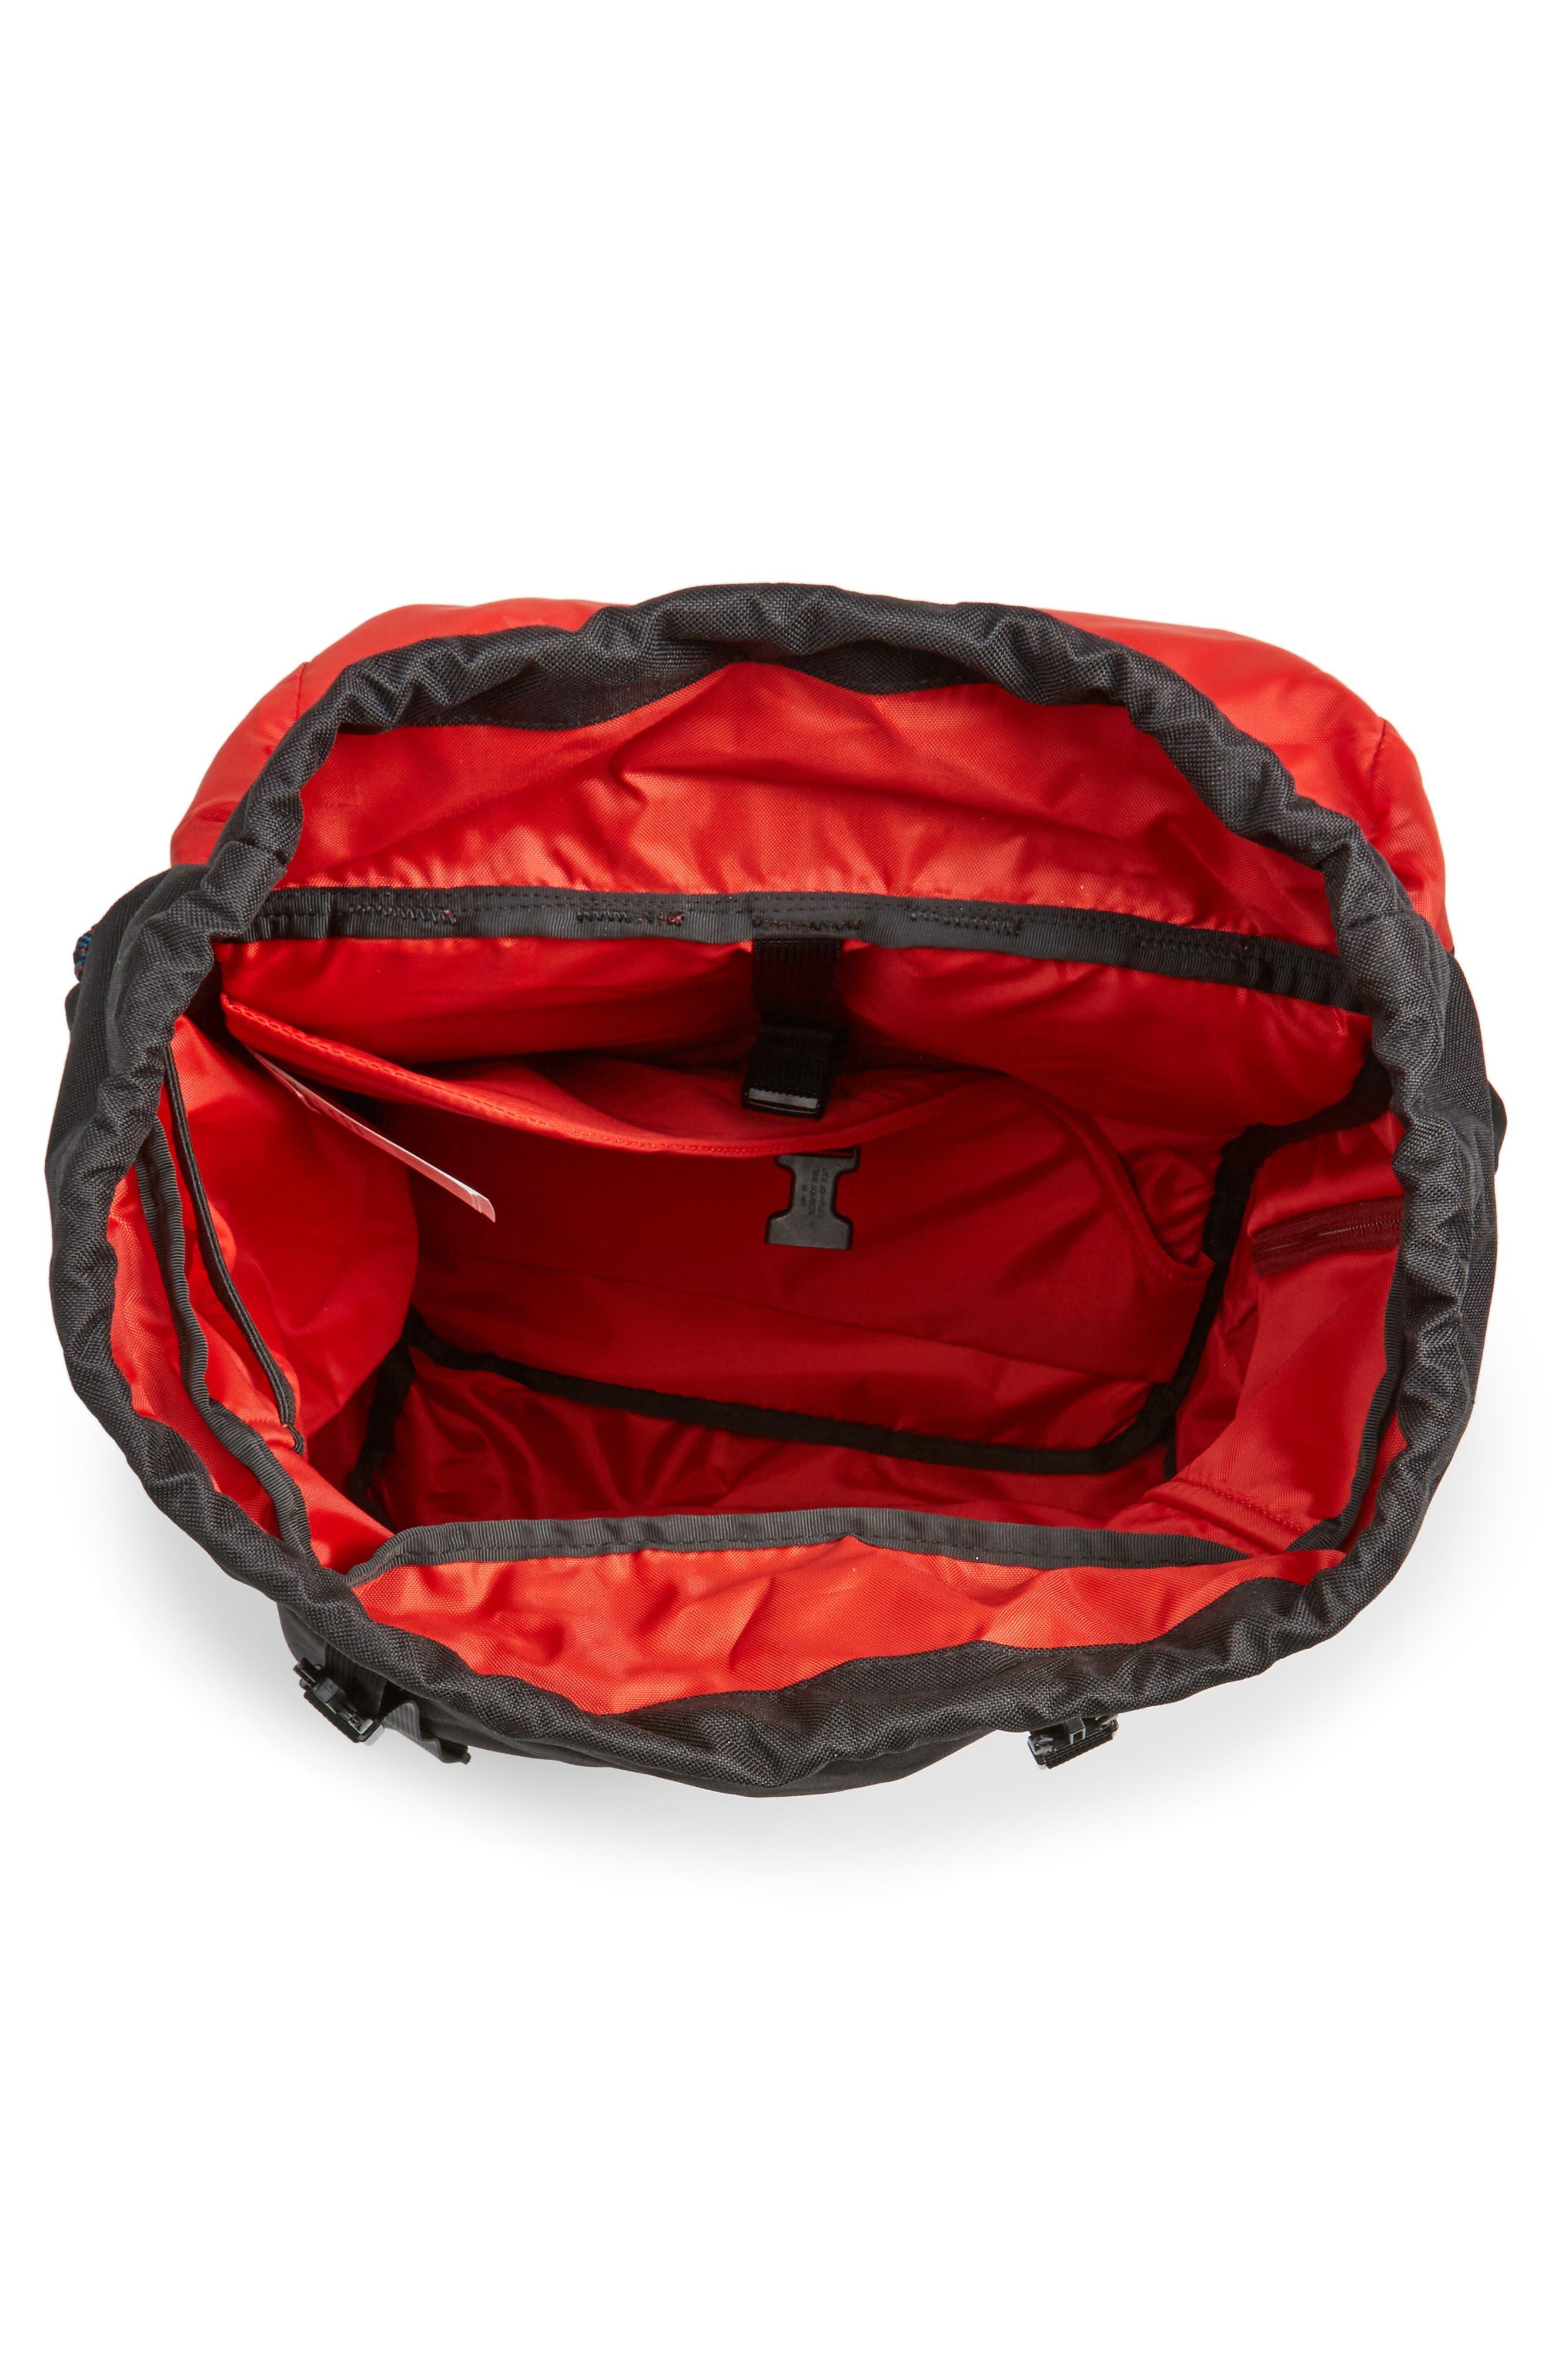 Arbor Grande 32-Liter Backpack,                             Alternate thumbnail 4, color,                             001